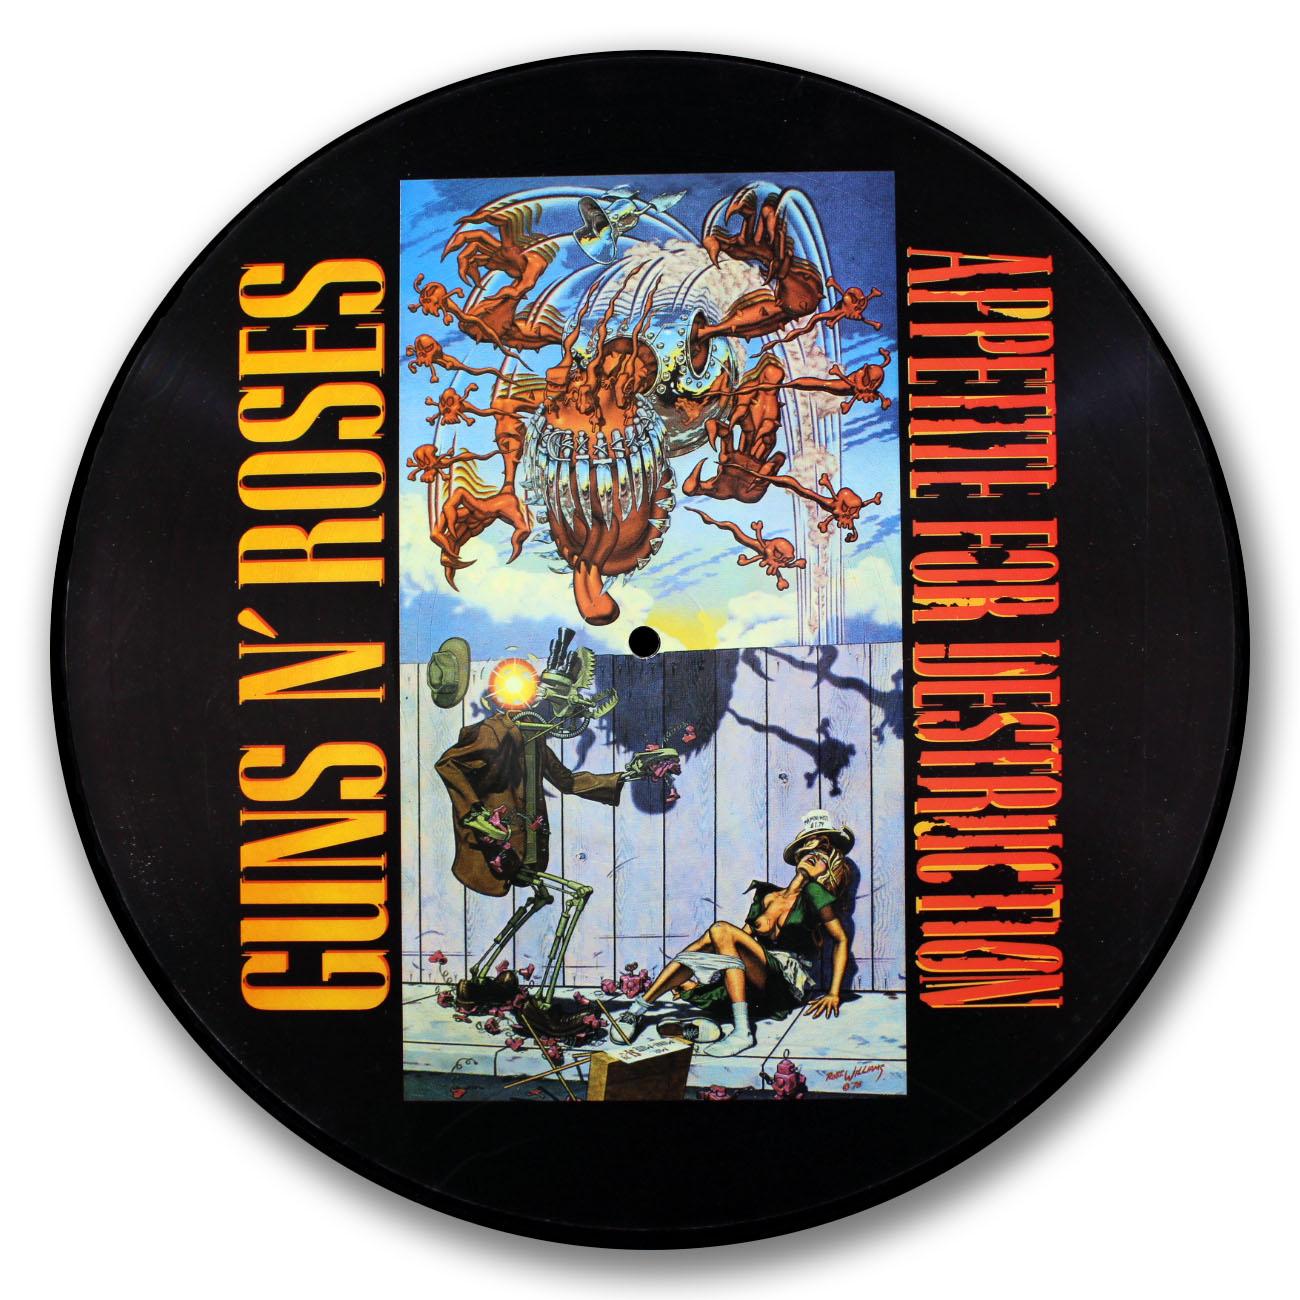 Guns N Roses, Appetite for Destruction Picture Disc